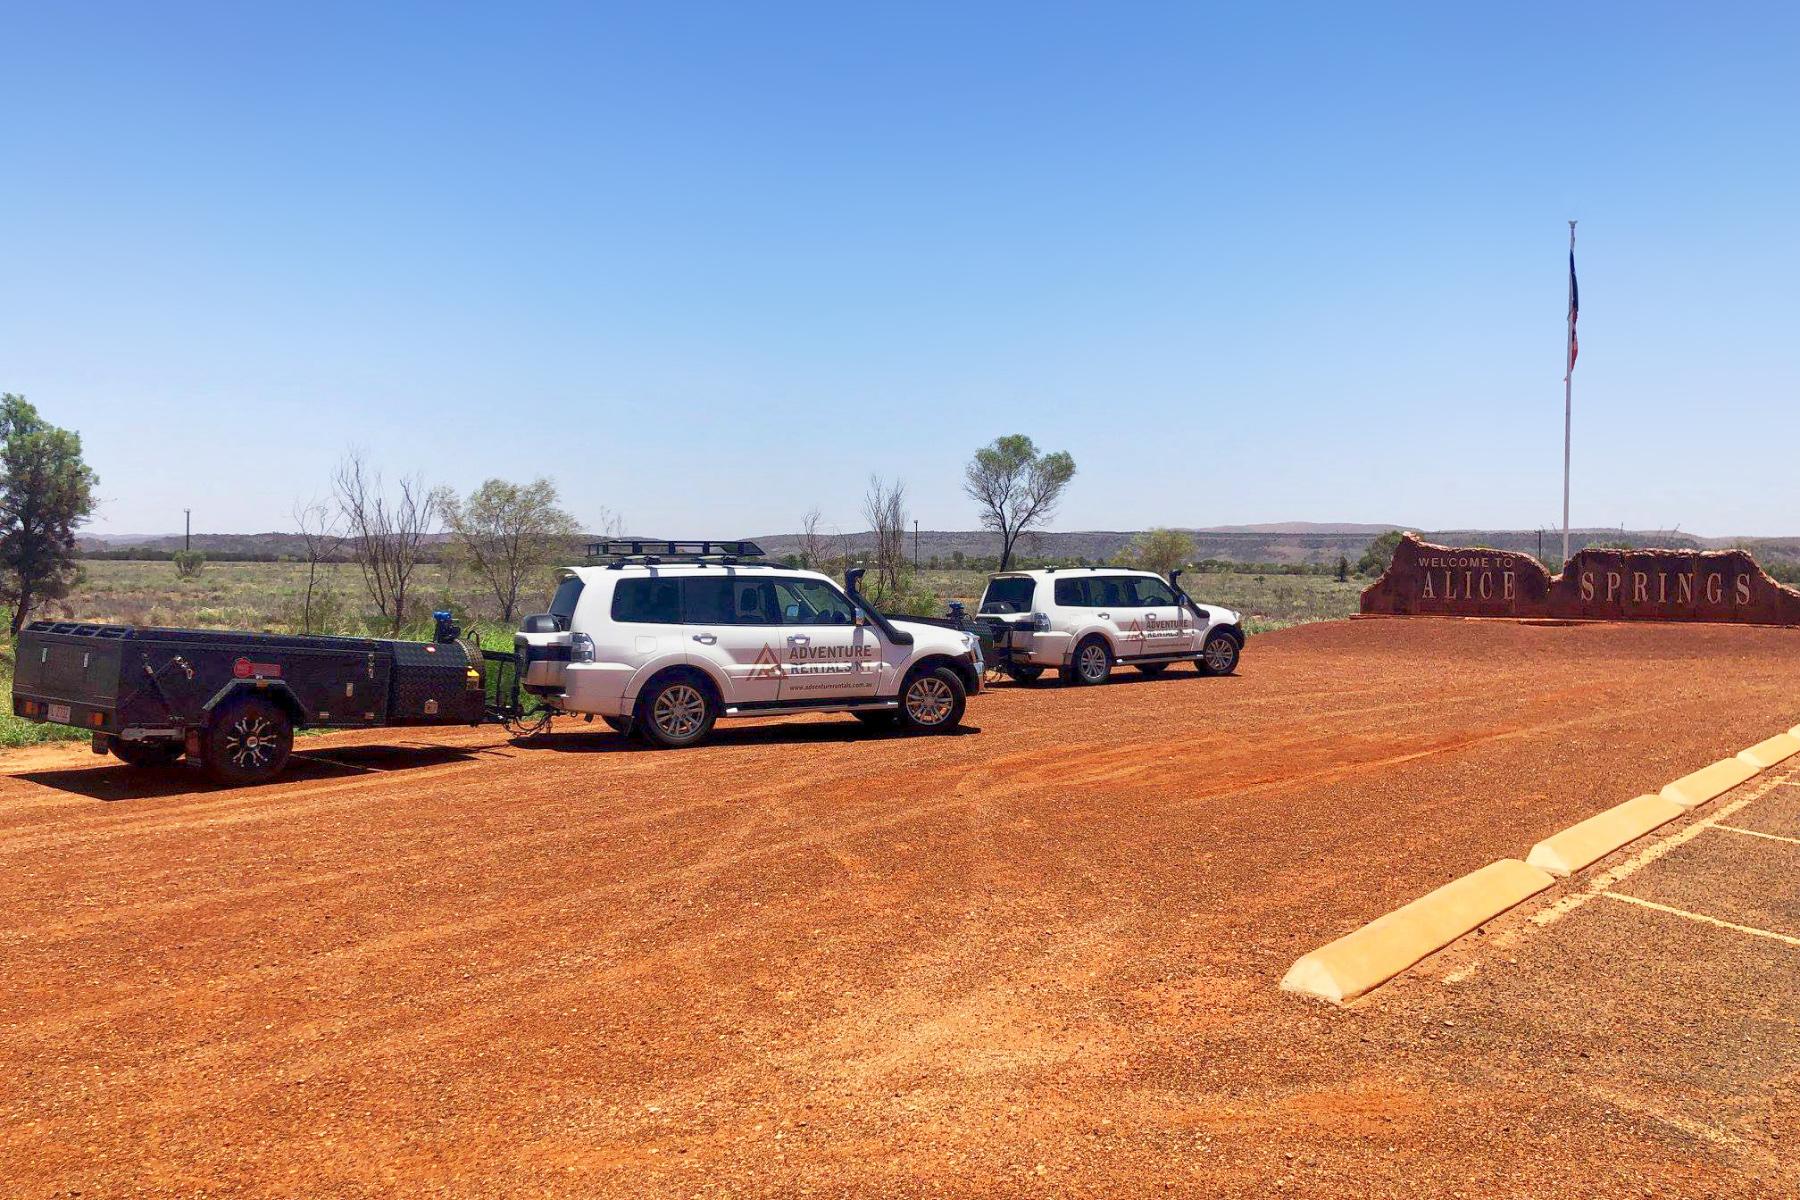 Adventure Rentals MARS camper trailers at Alice Springs